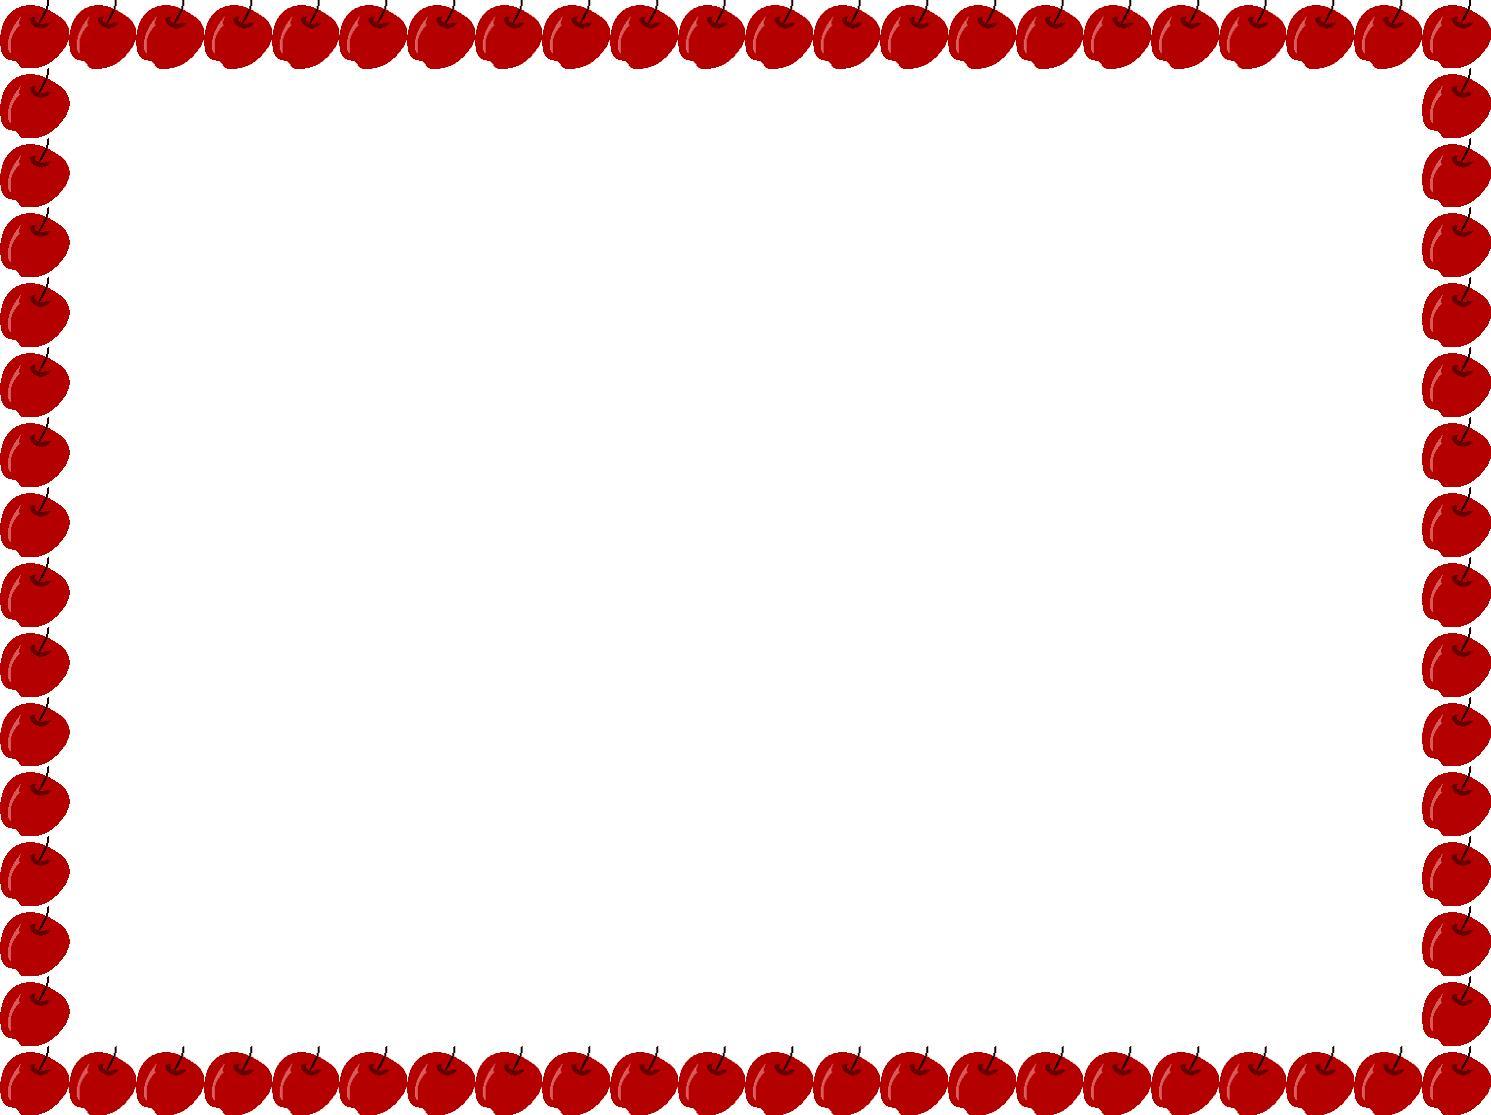 Free Polka Dot Border Clip Art Cliparts Co